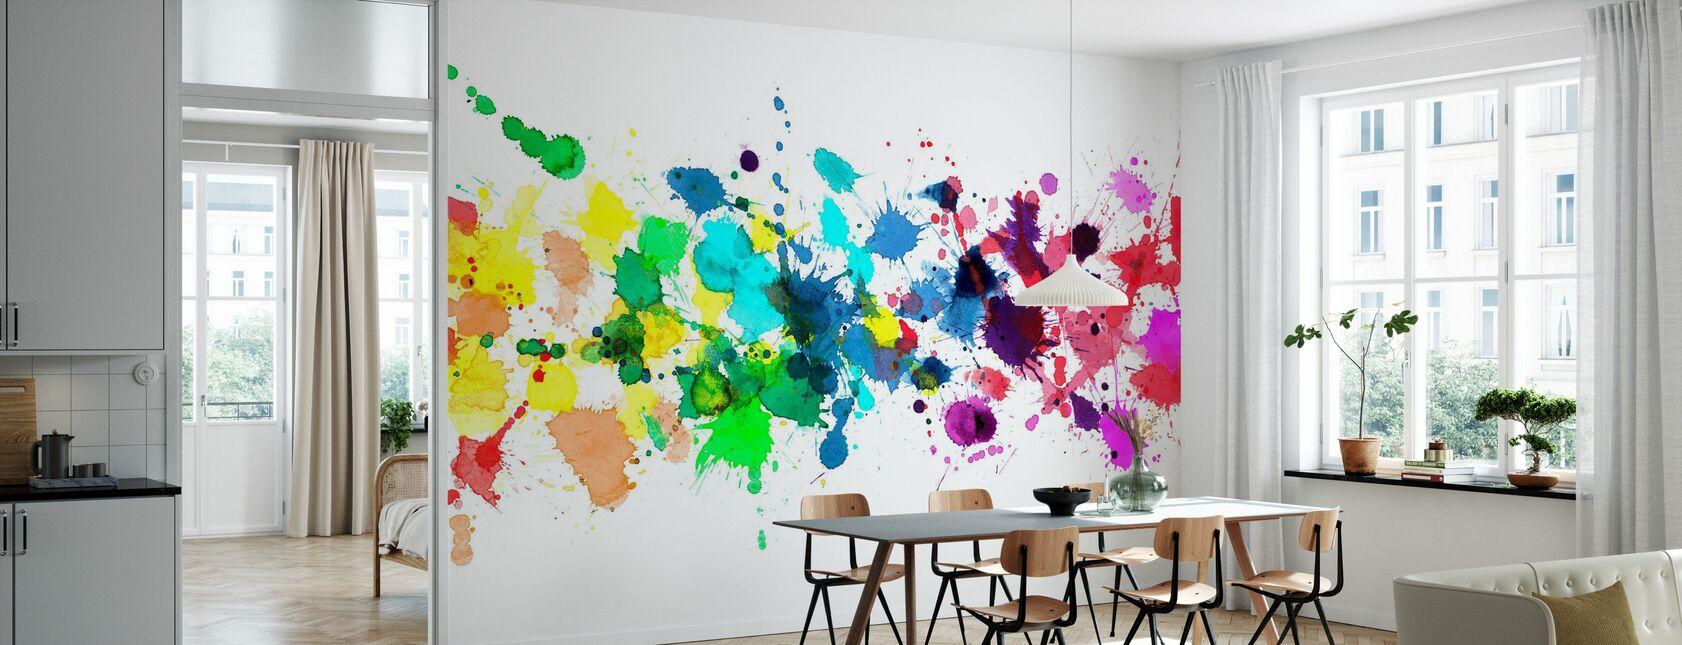 Watercolour Rainbow - Wallpaper - Kitchen